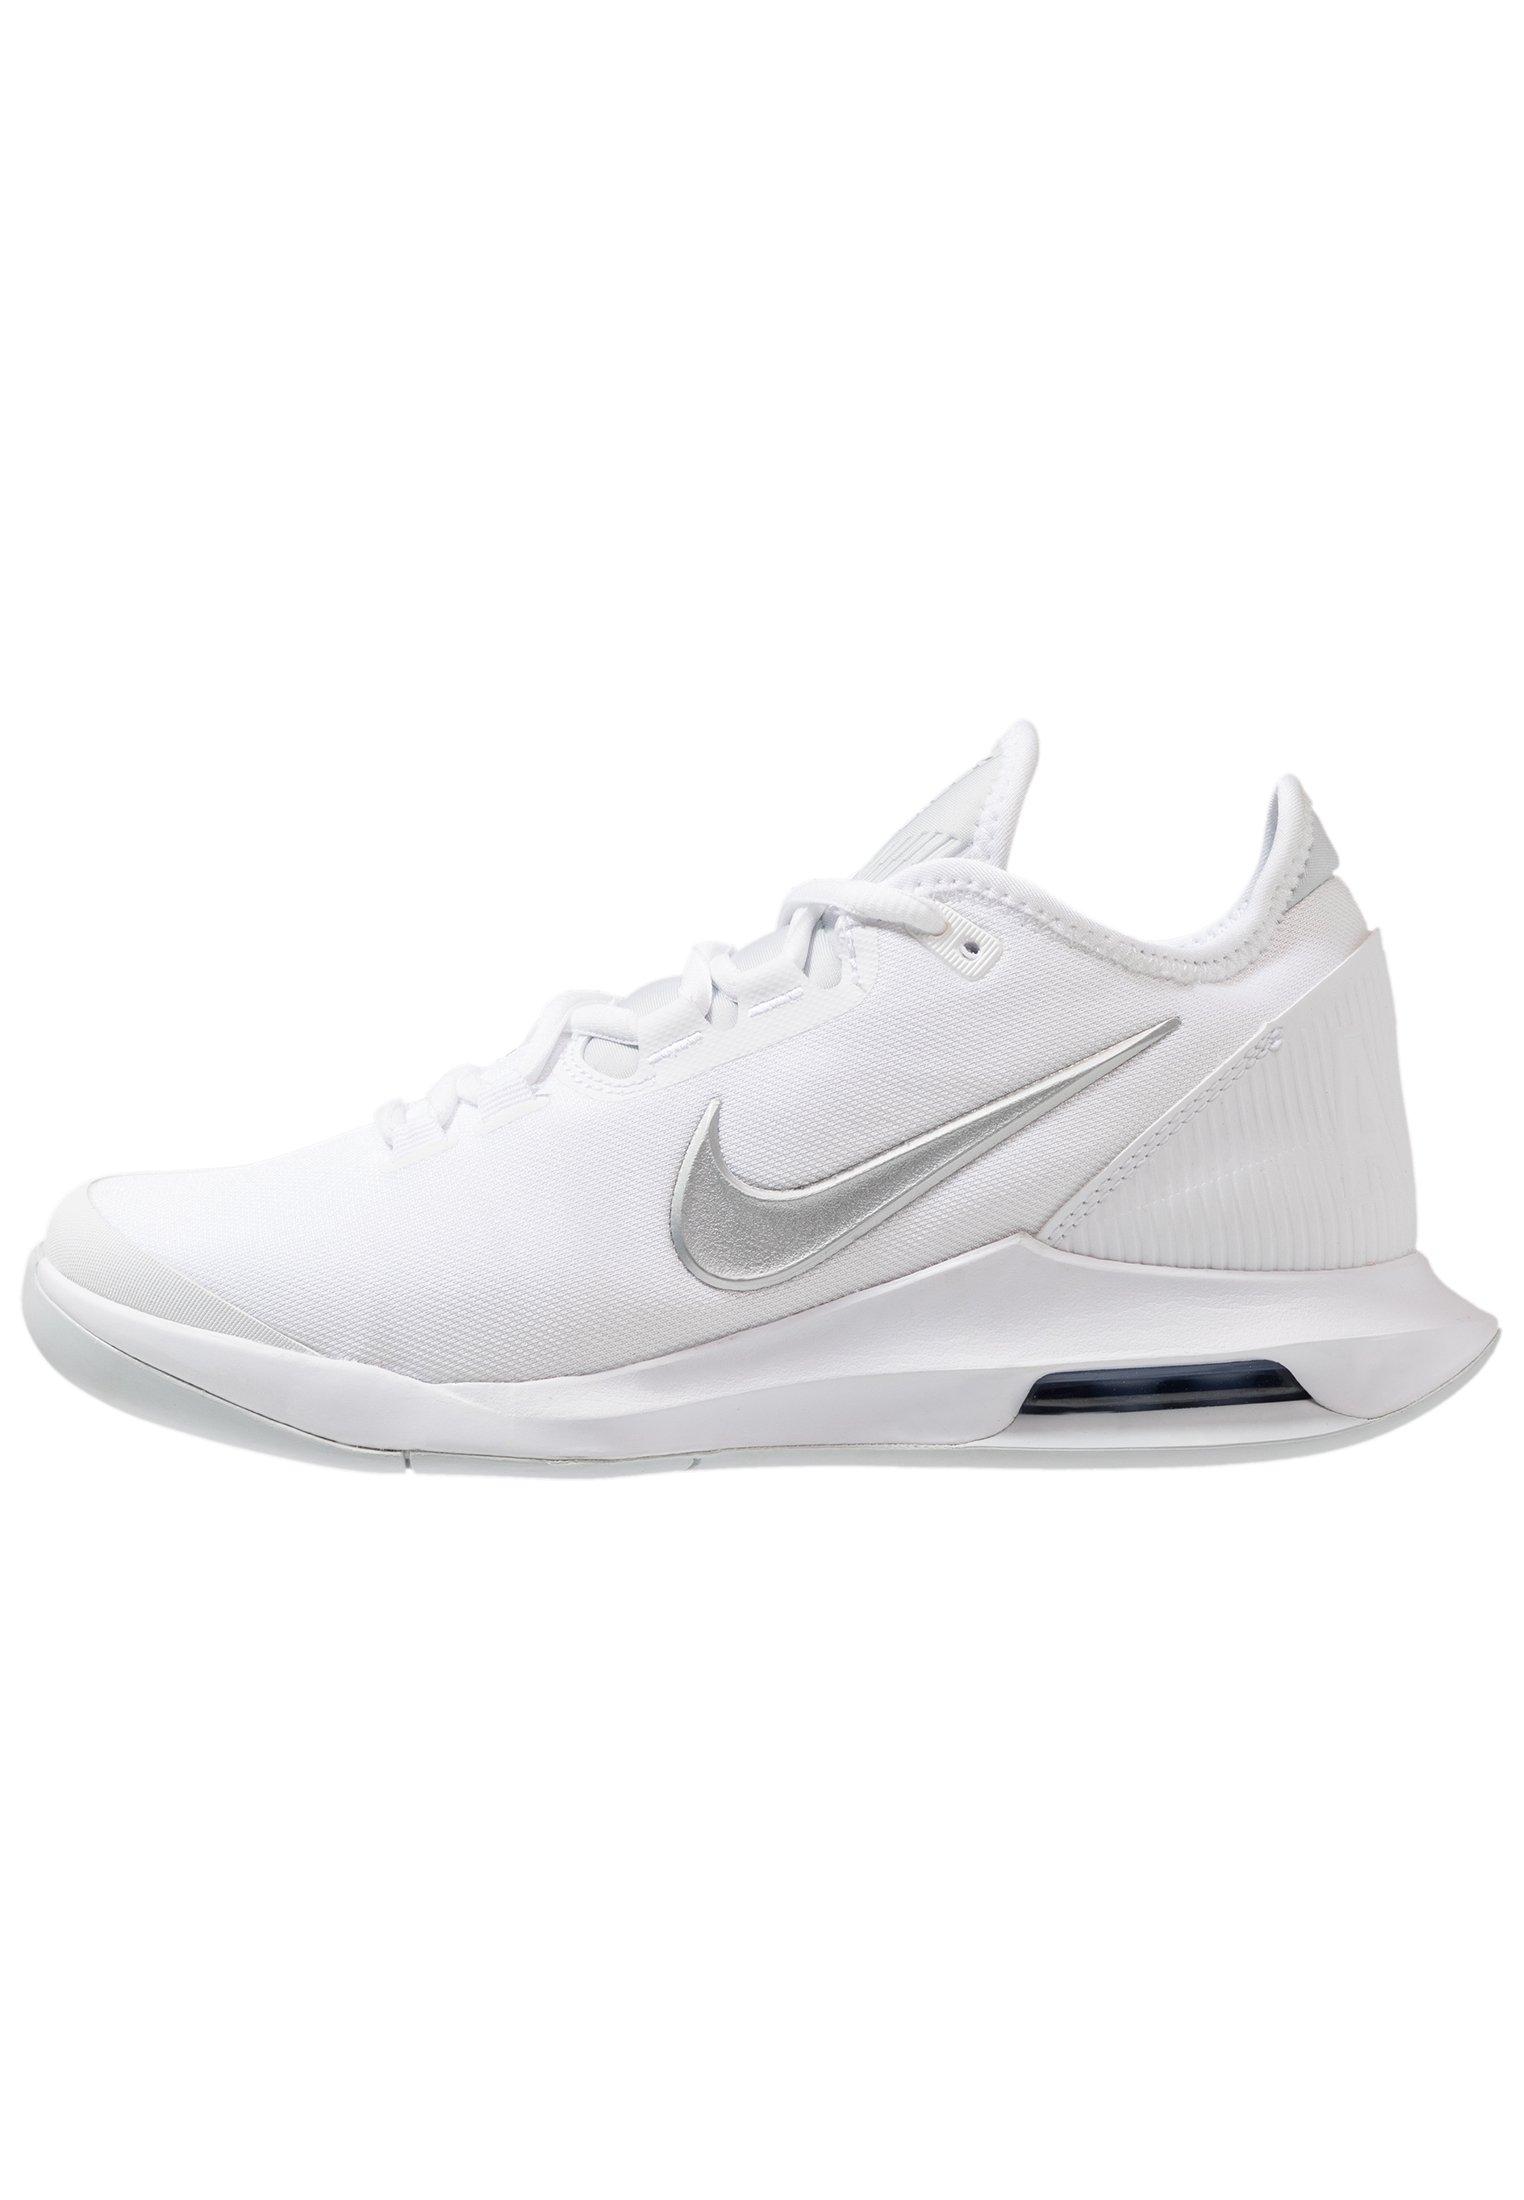 COURT AIR MAX WILDCARD - Chaussures de tennis toutes surfaces - white/metallic silver/pure platinum/aluminum